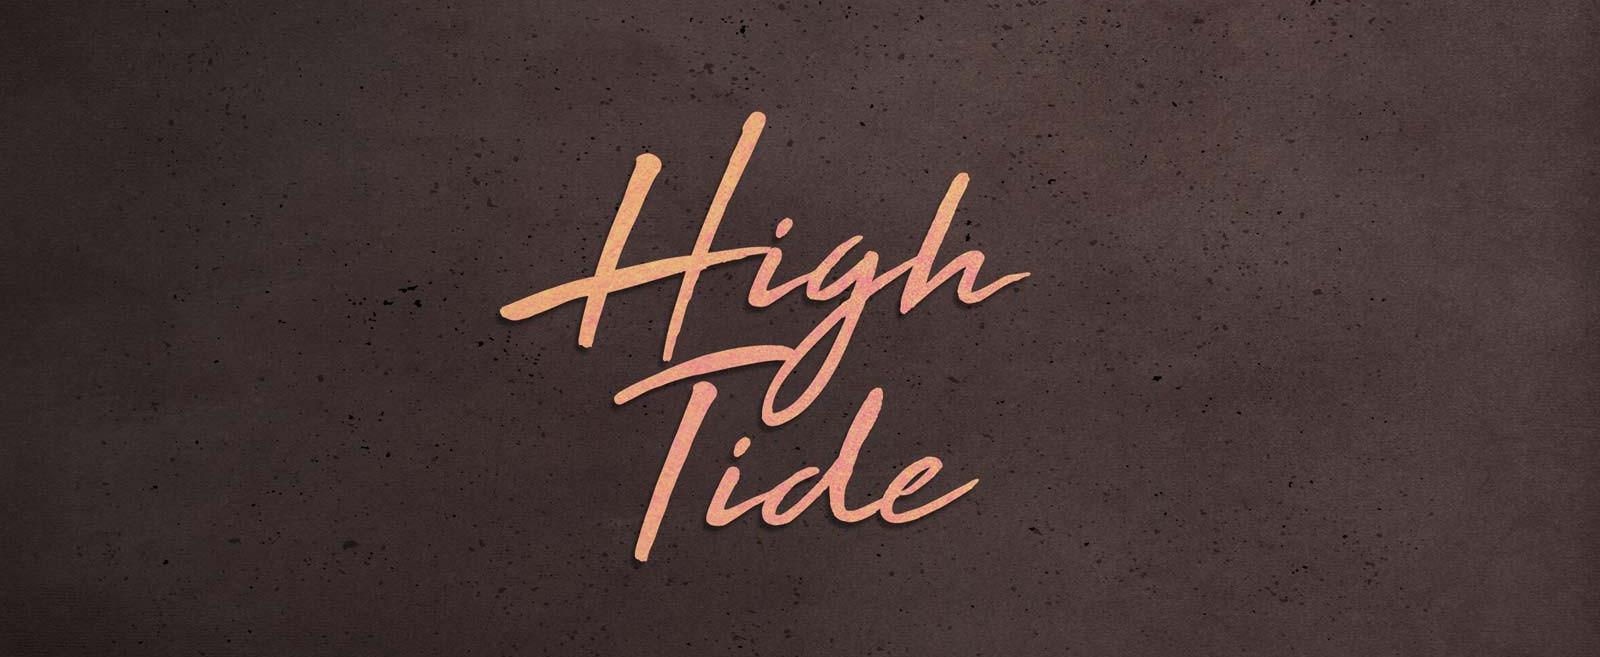 high-tide-1